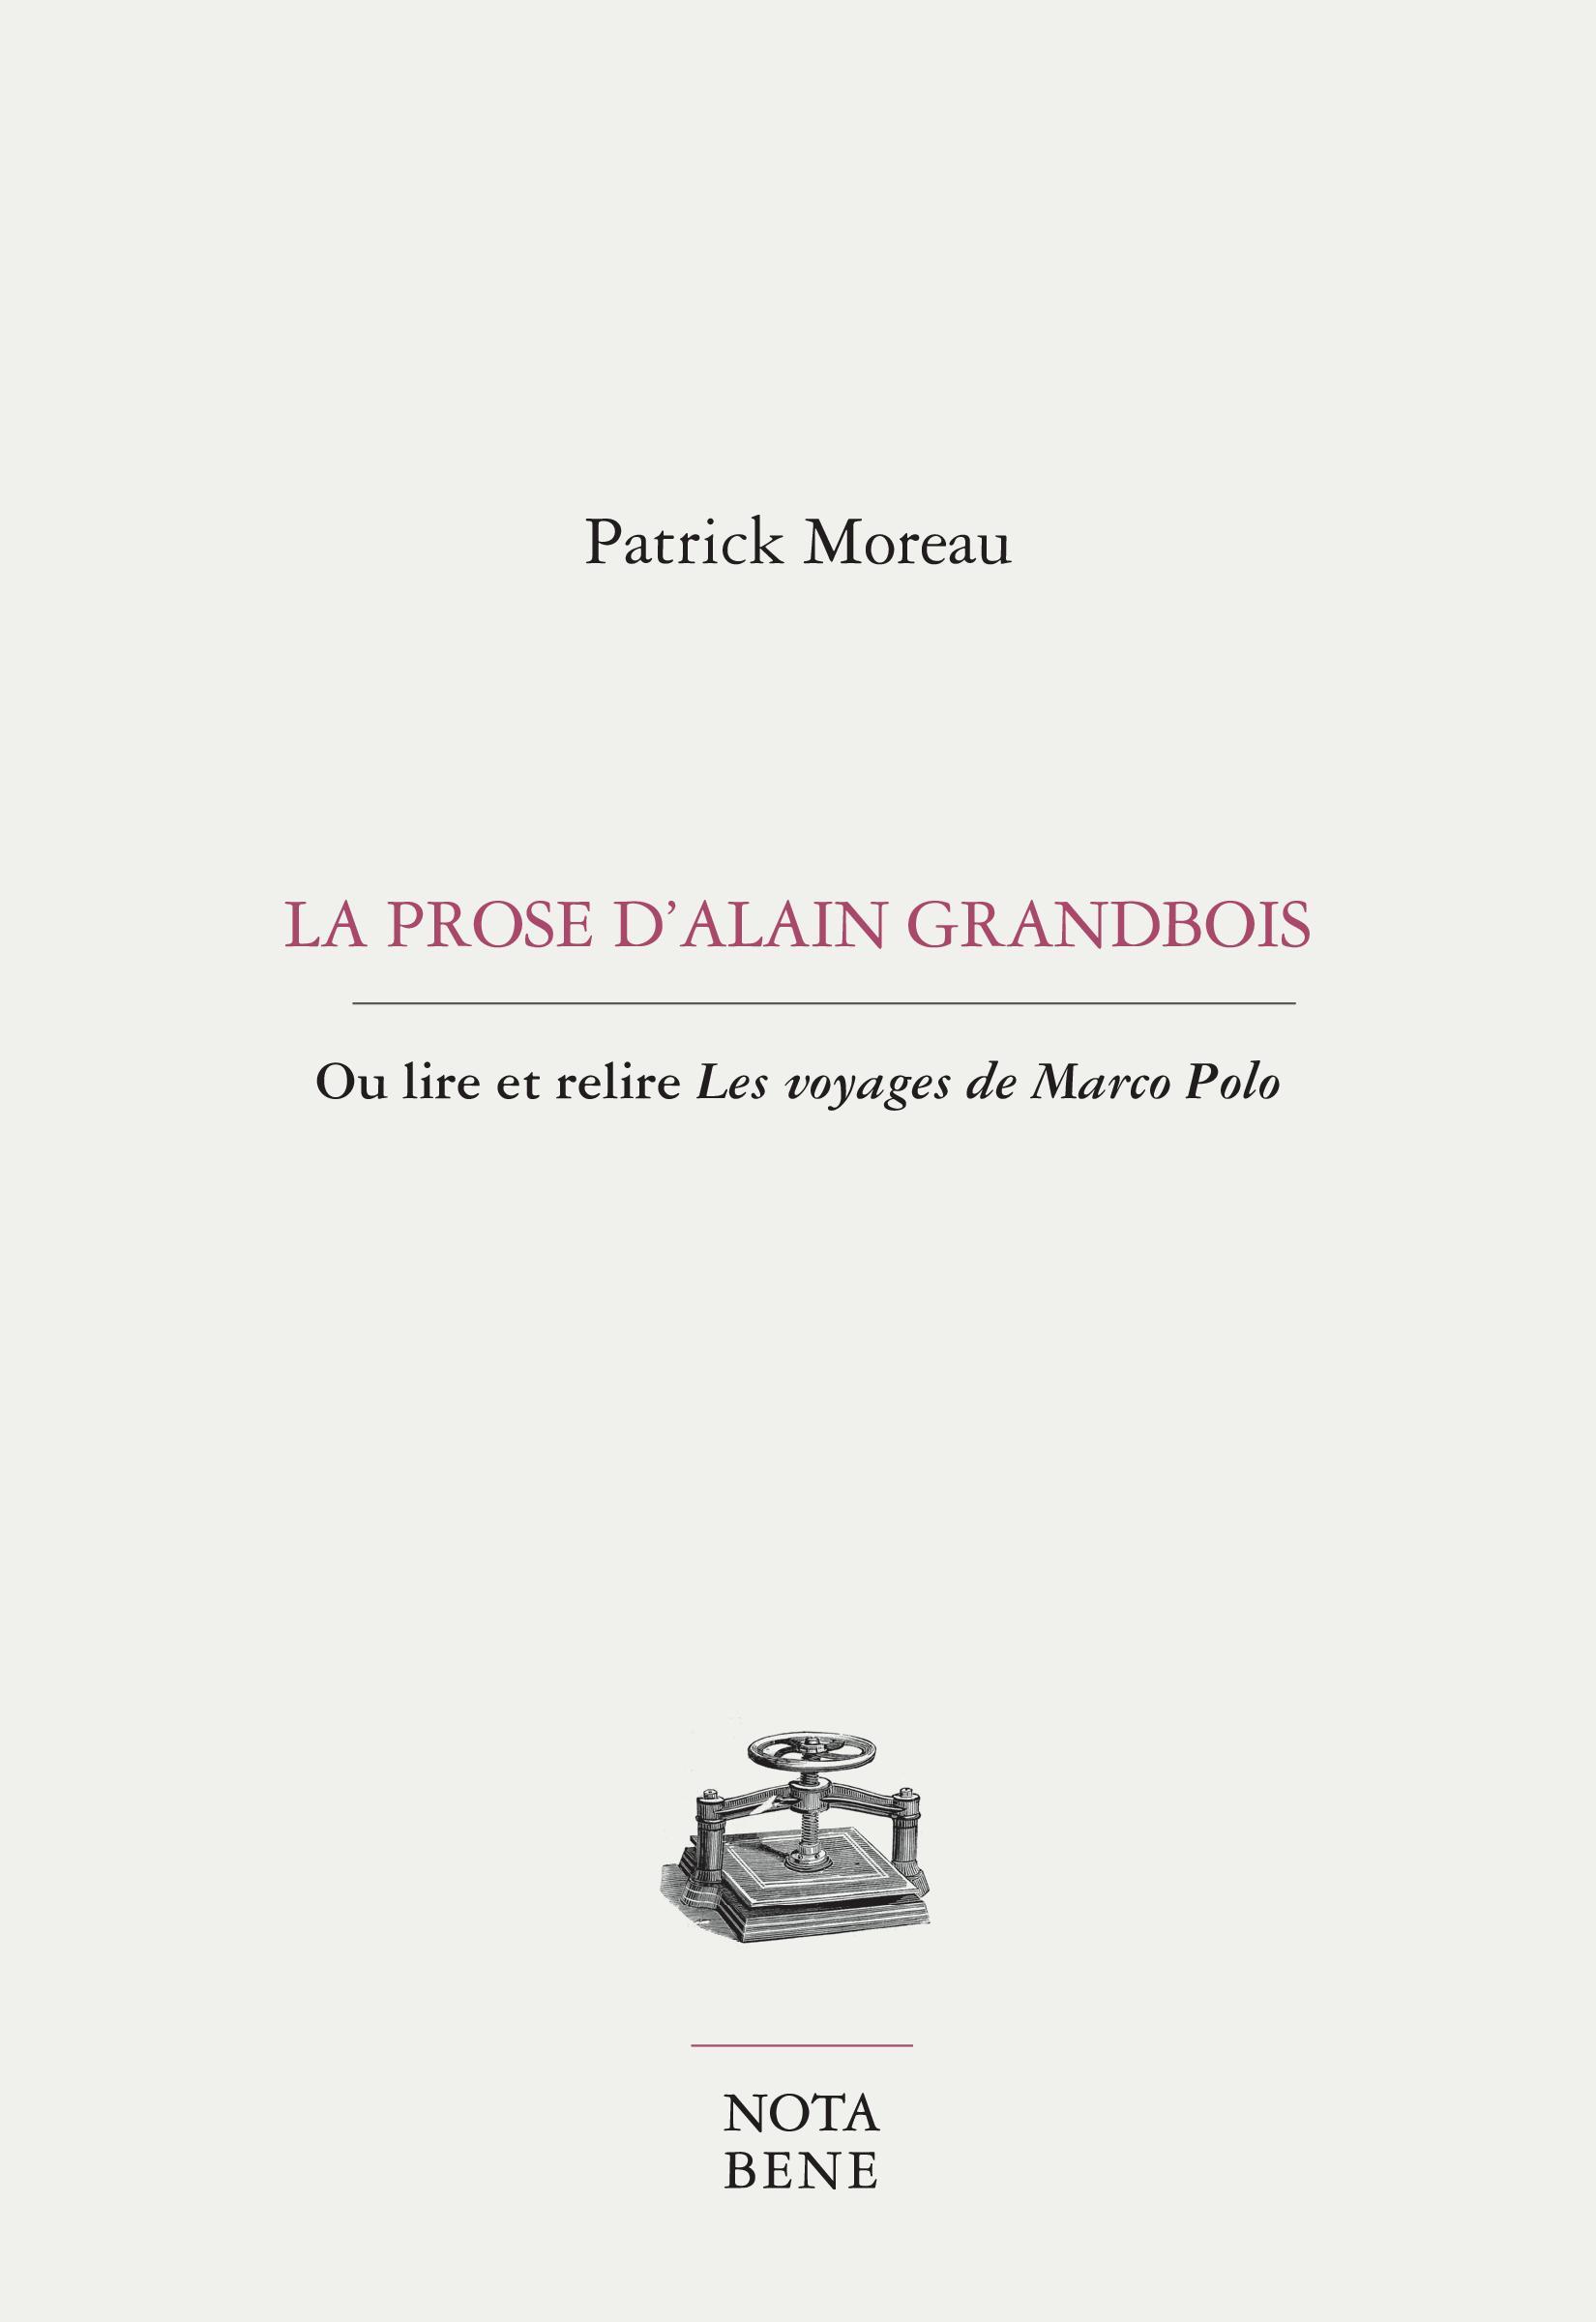 La prose d'Alain Grandbois